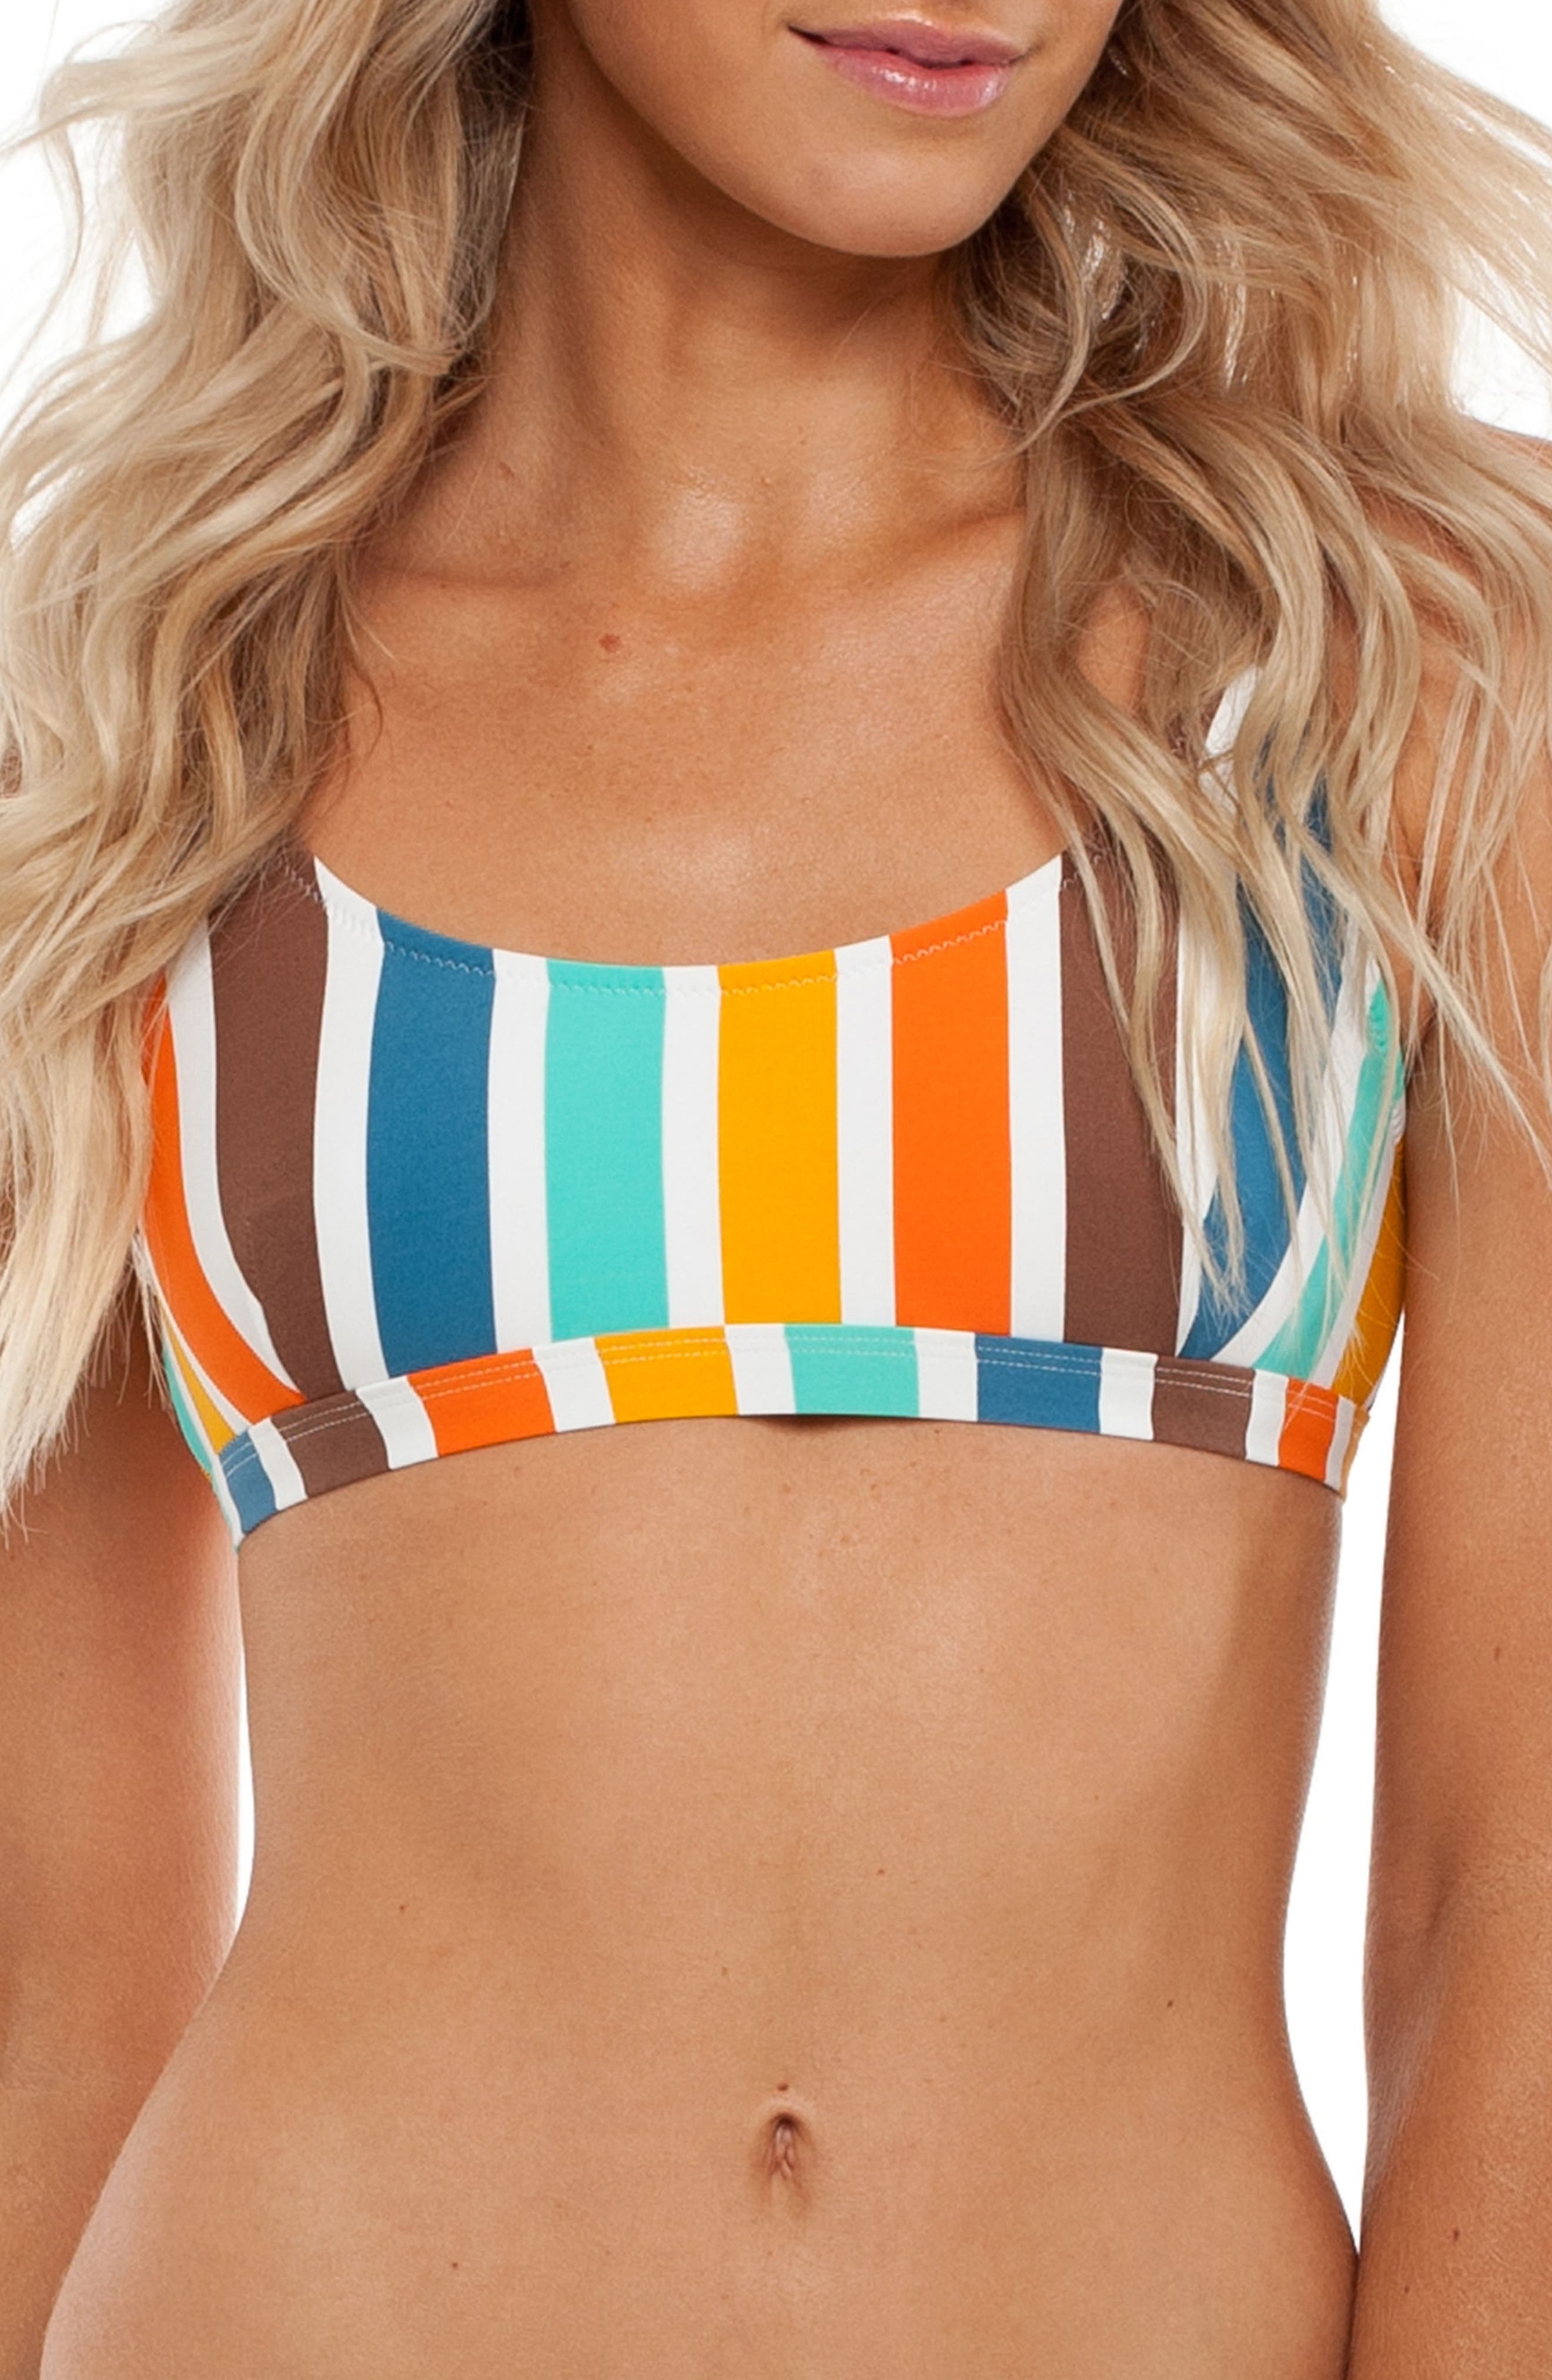 Zimbabwe Scoop Bikini Top,                             Main thumbnail 1, color,                             810